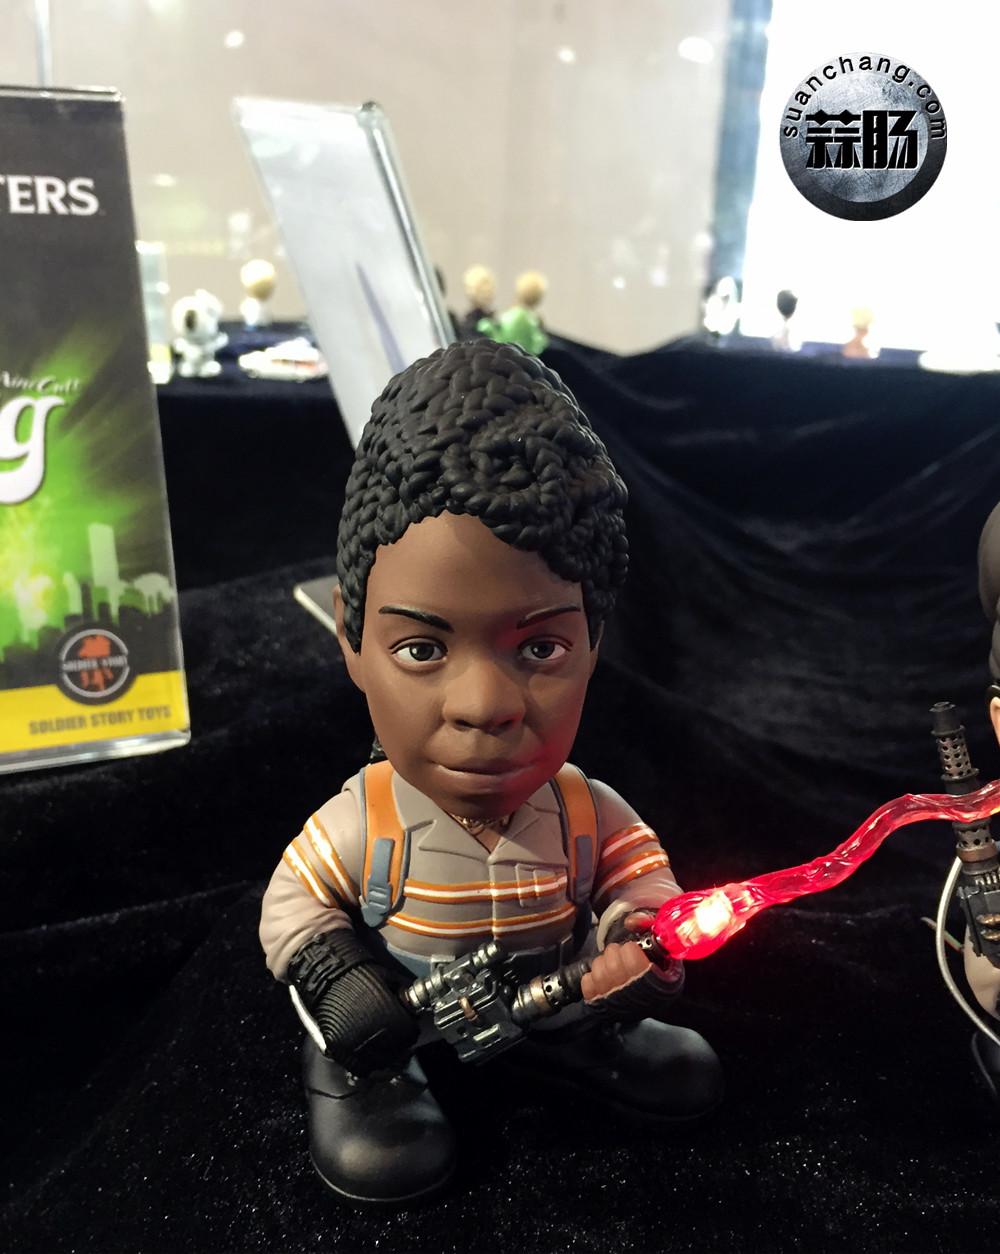 Soldier Story 推出的《捉鬼敢死队3》新角色人偶及周边产品亮相 模玩 第7张